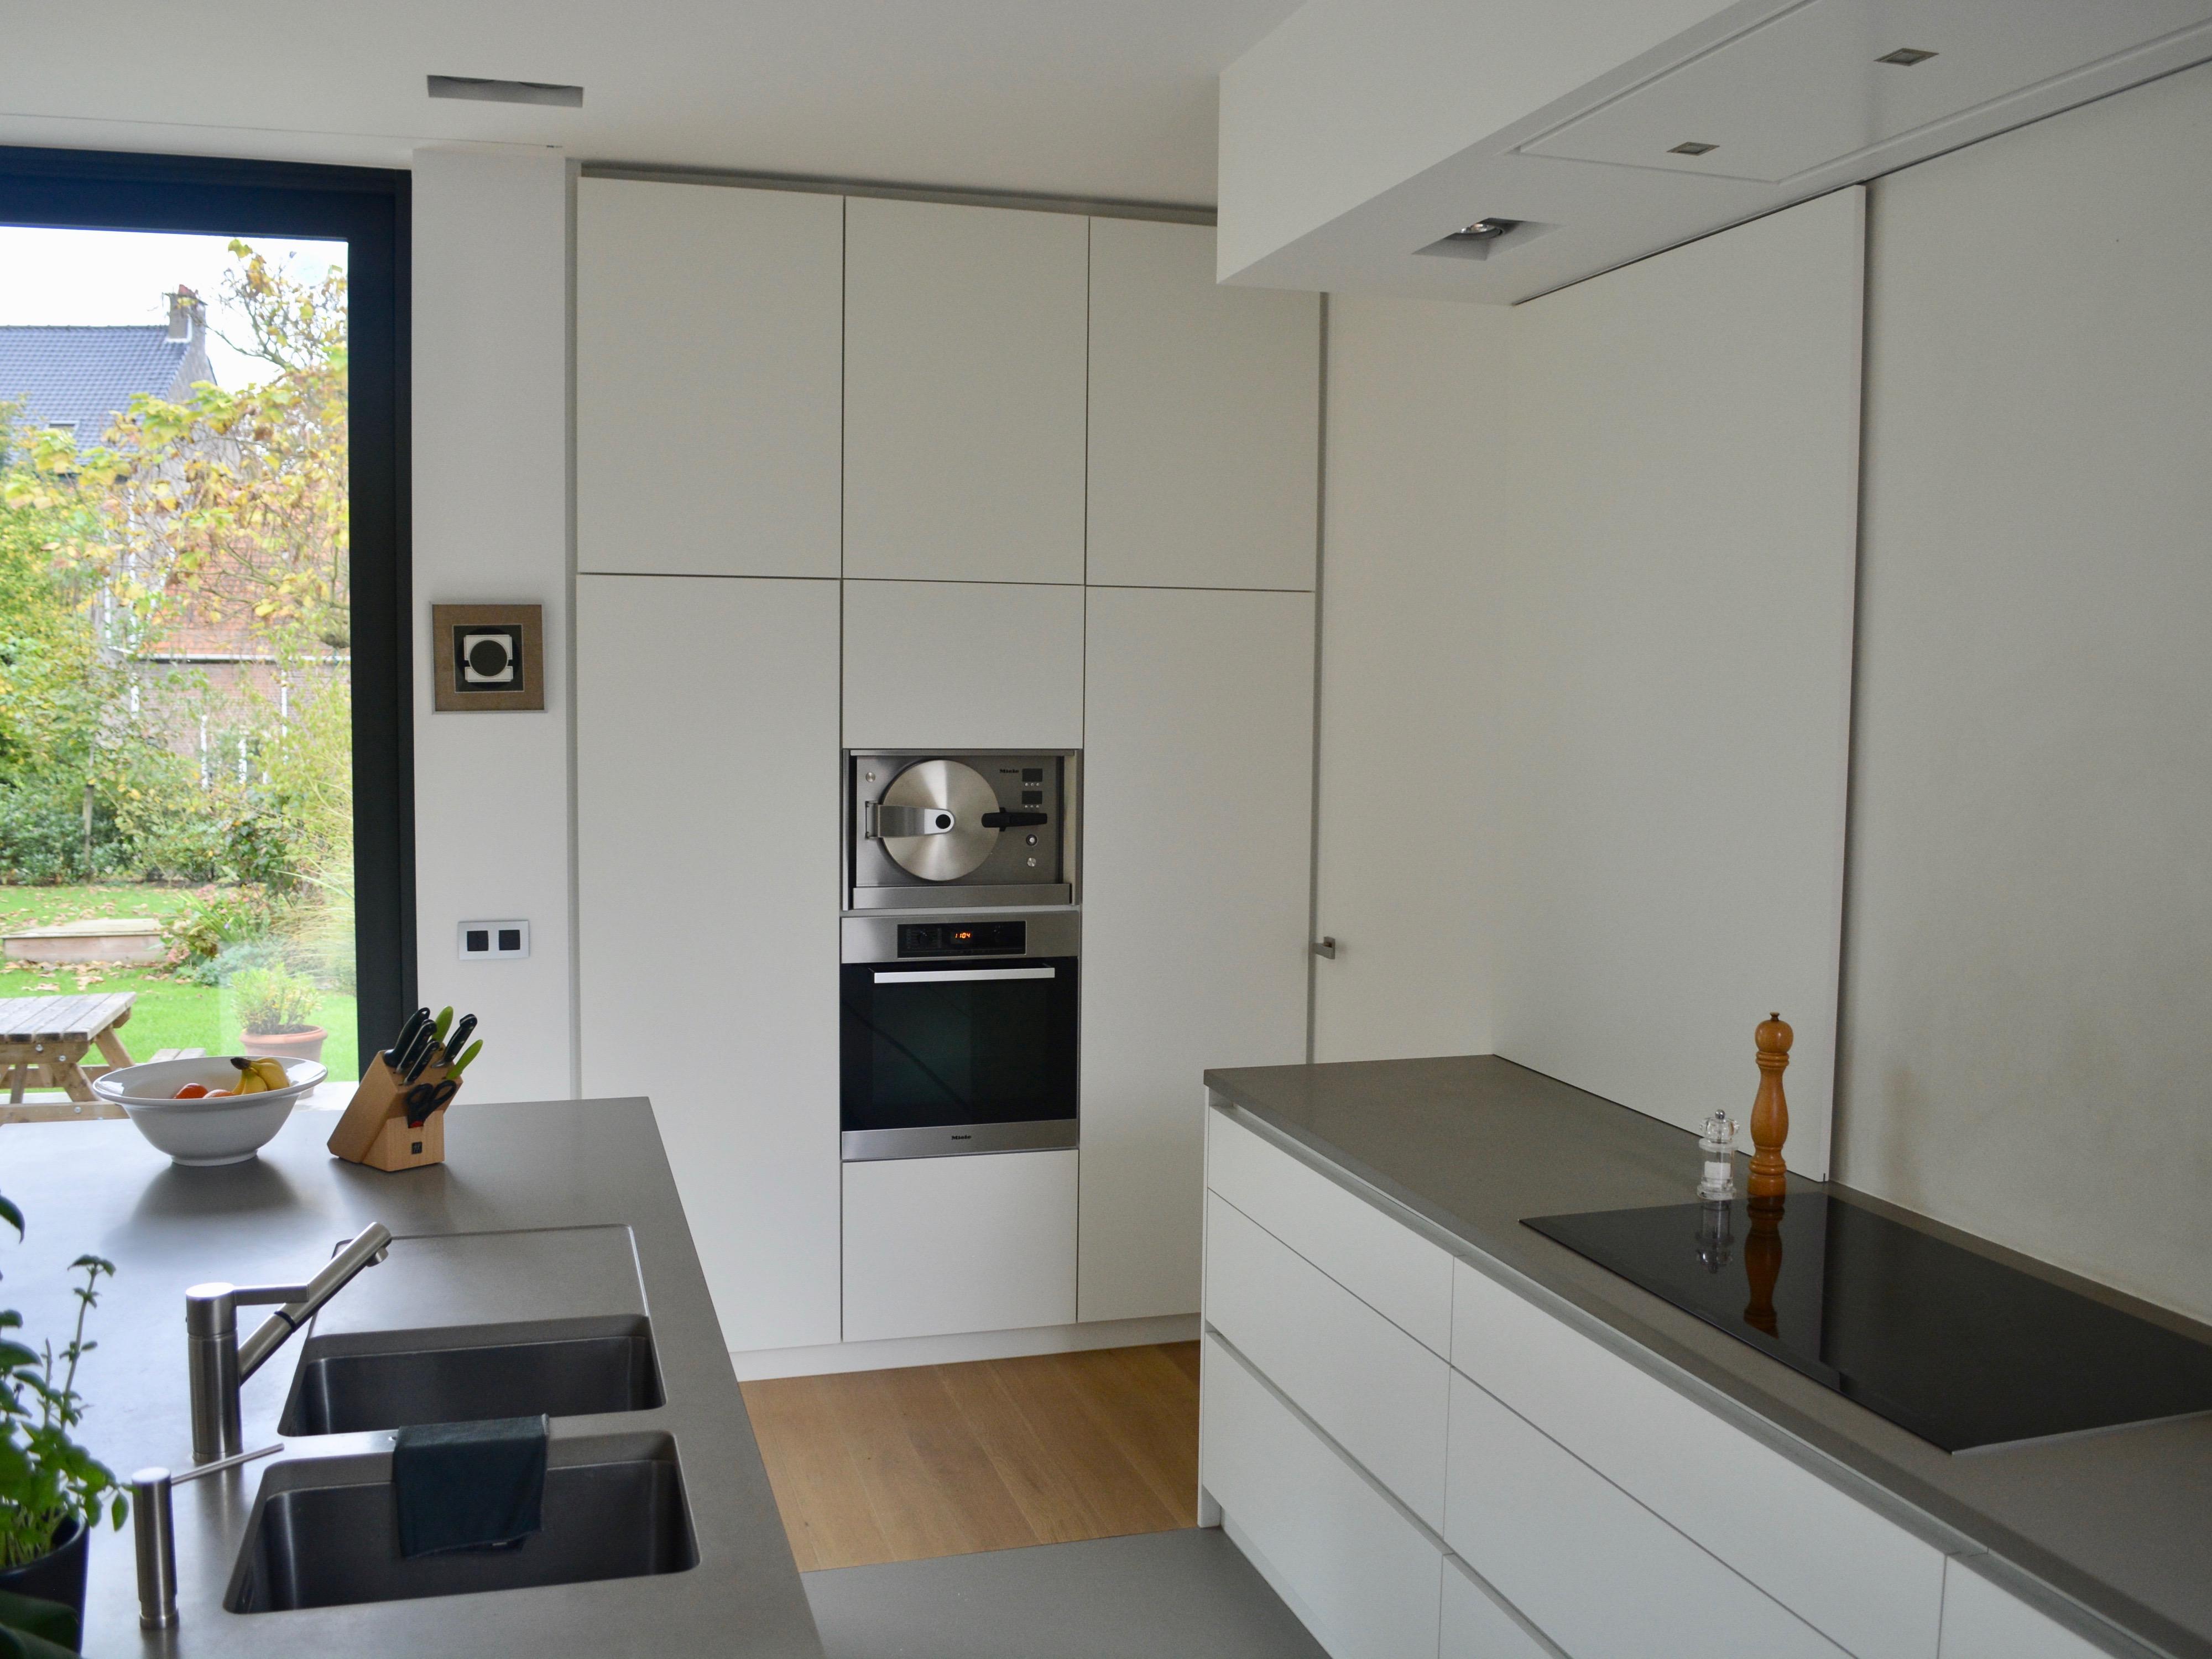 Design Keuken Greeploos : Keuken greeploos in 2 design